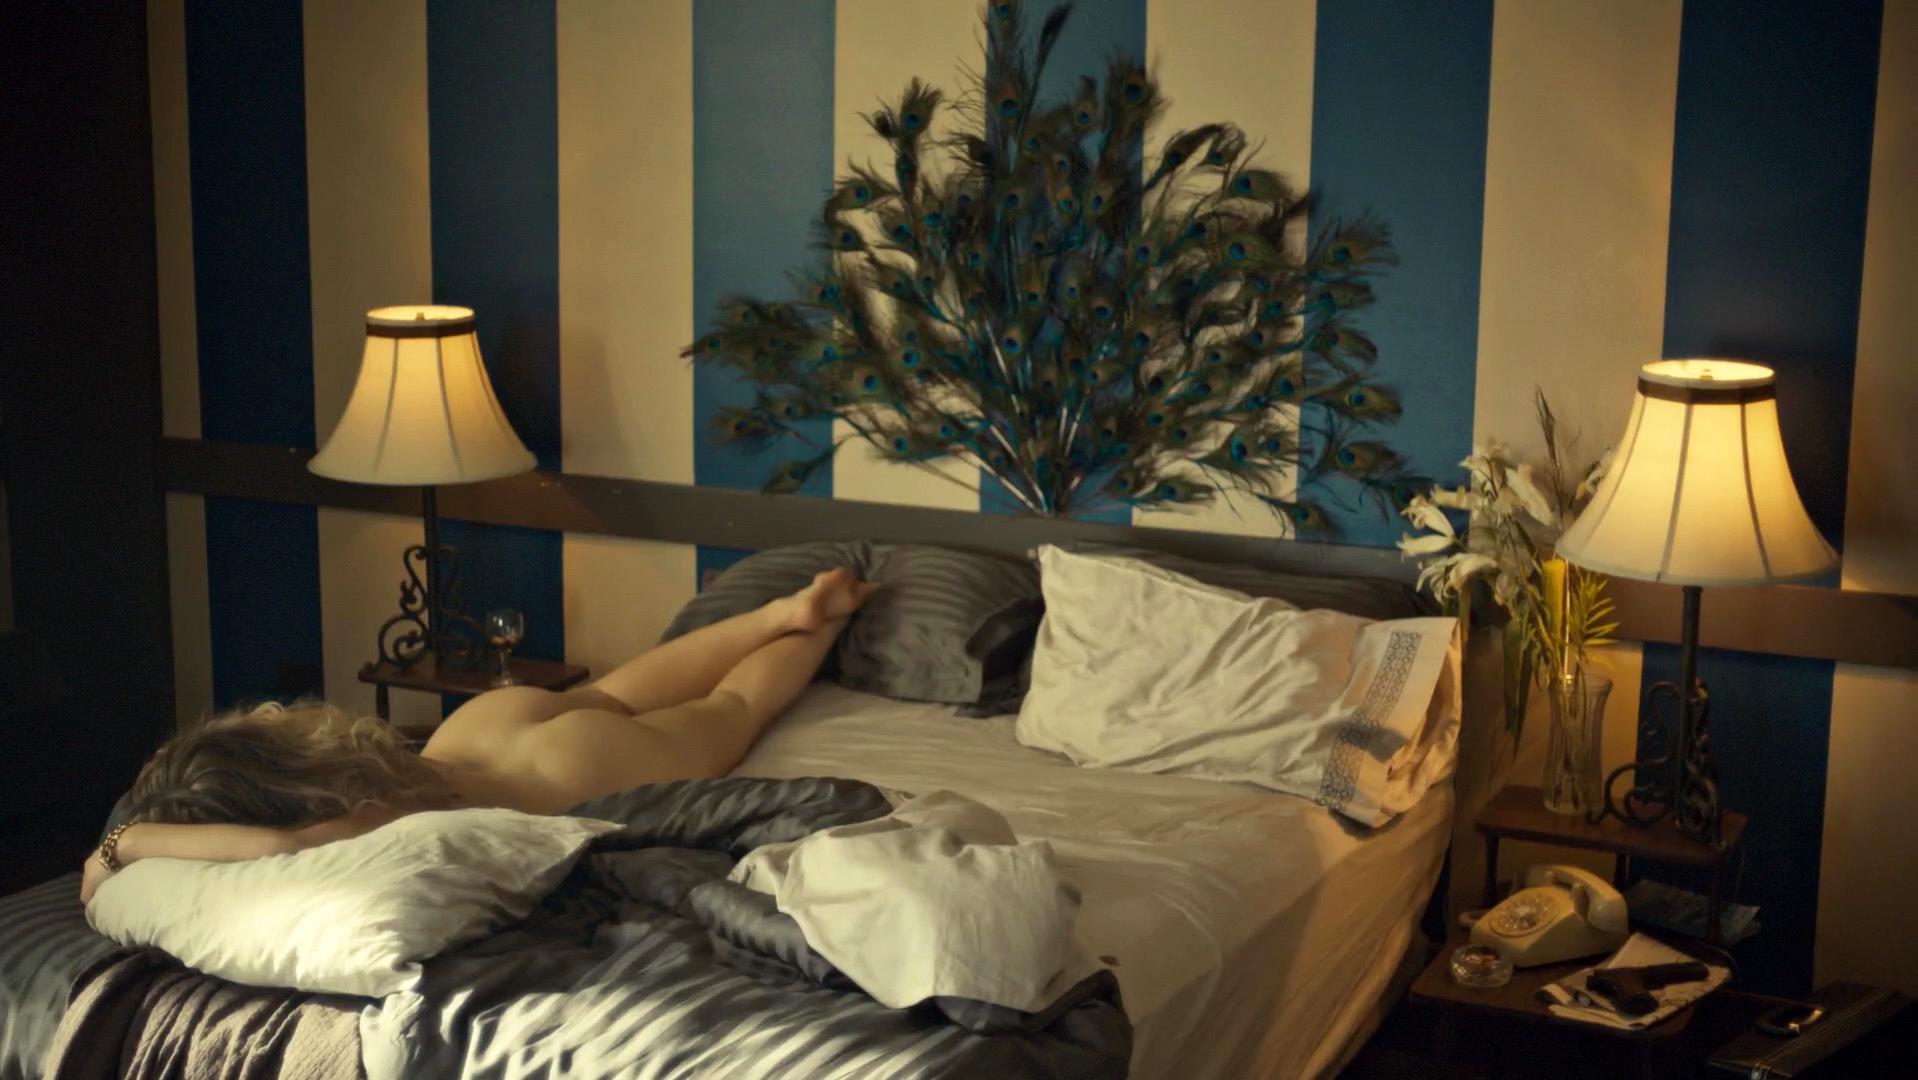 Rachel Keller nude - Fargo s02e04 (2015)